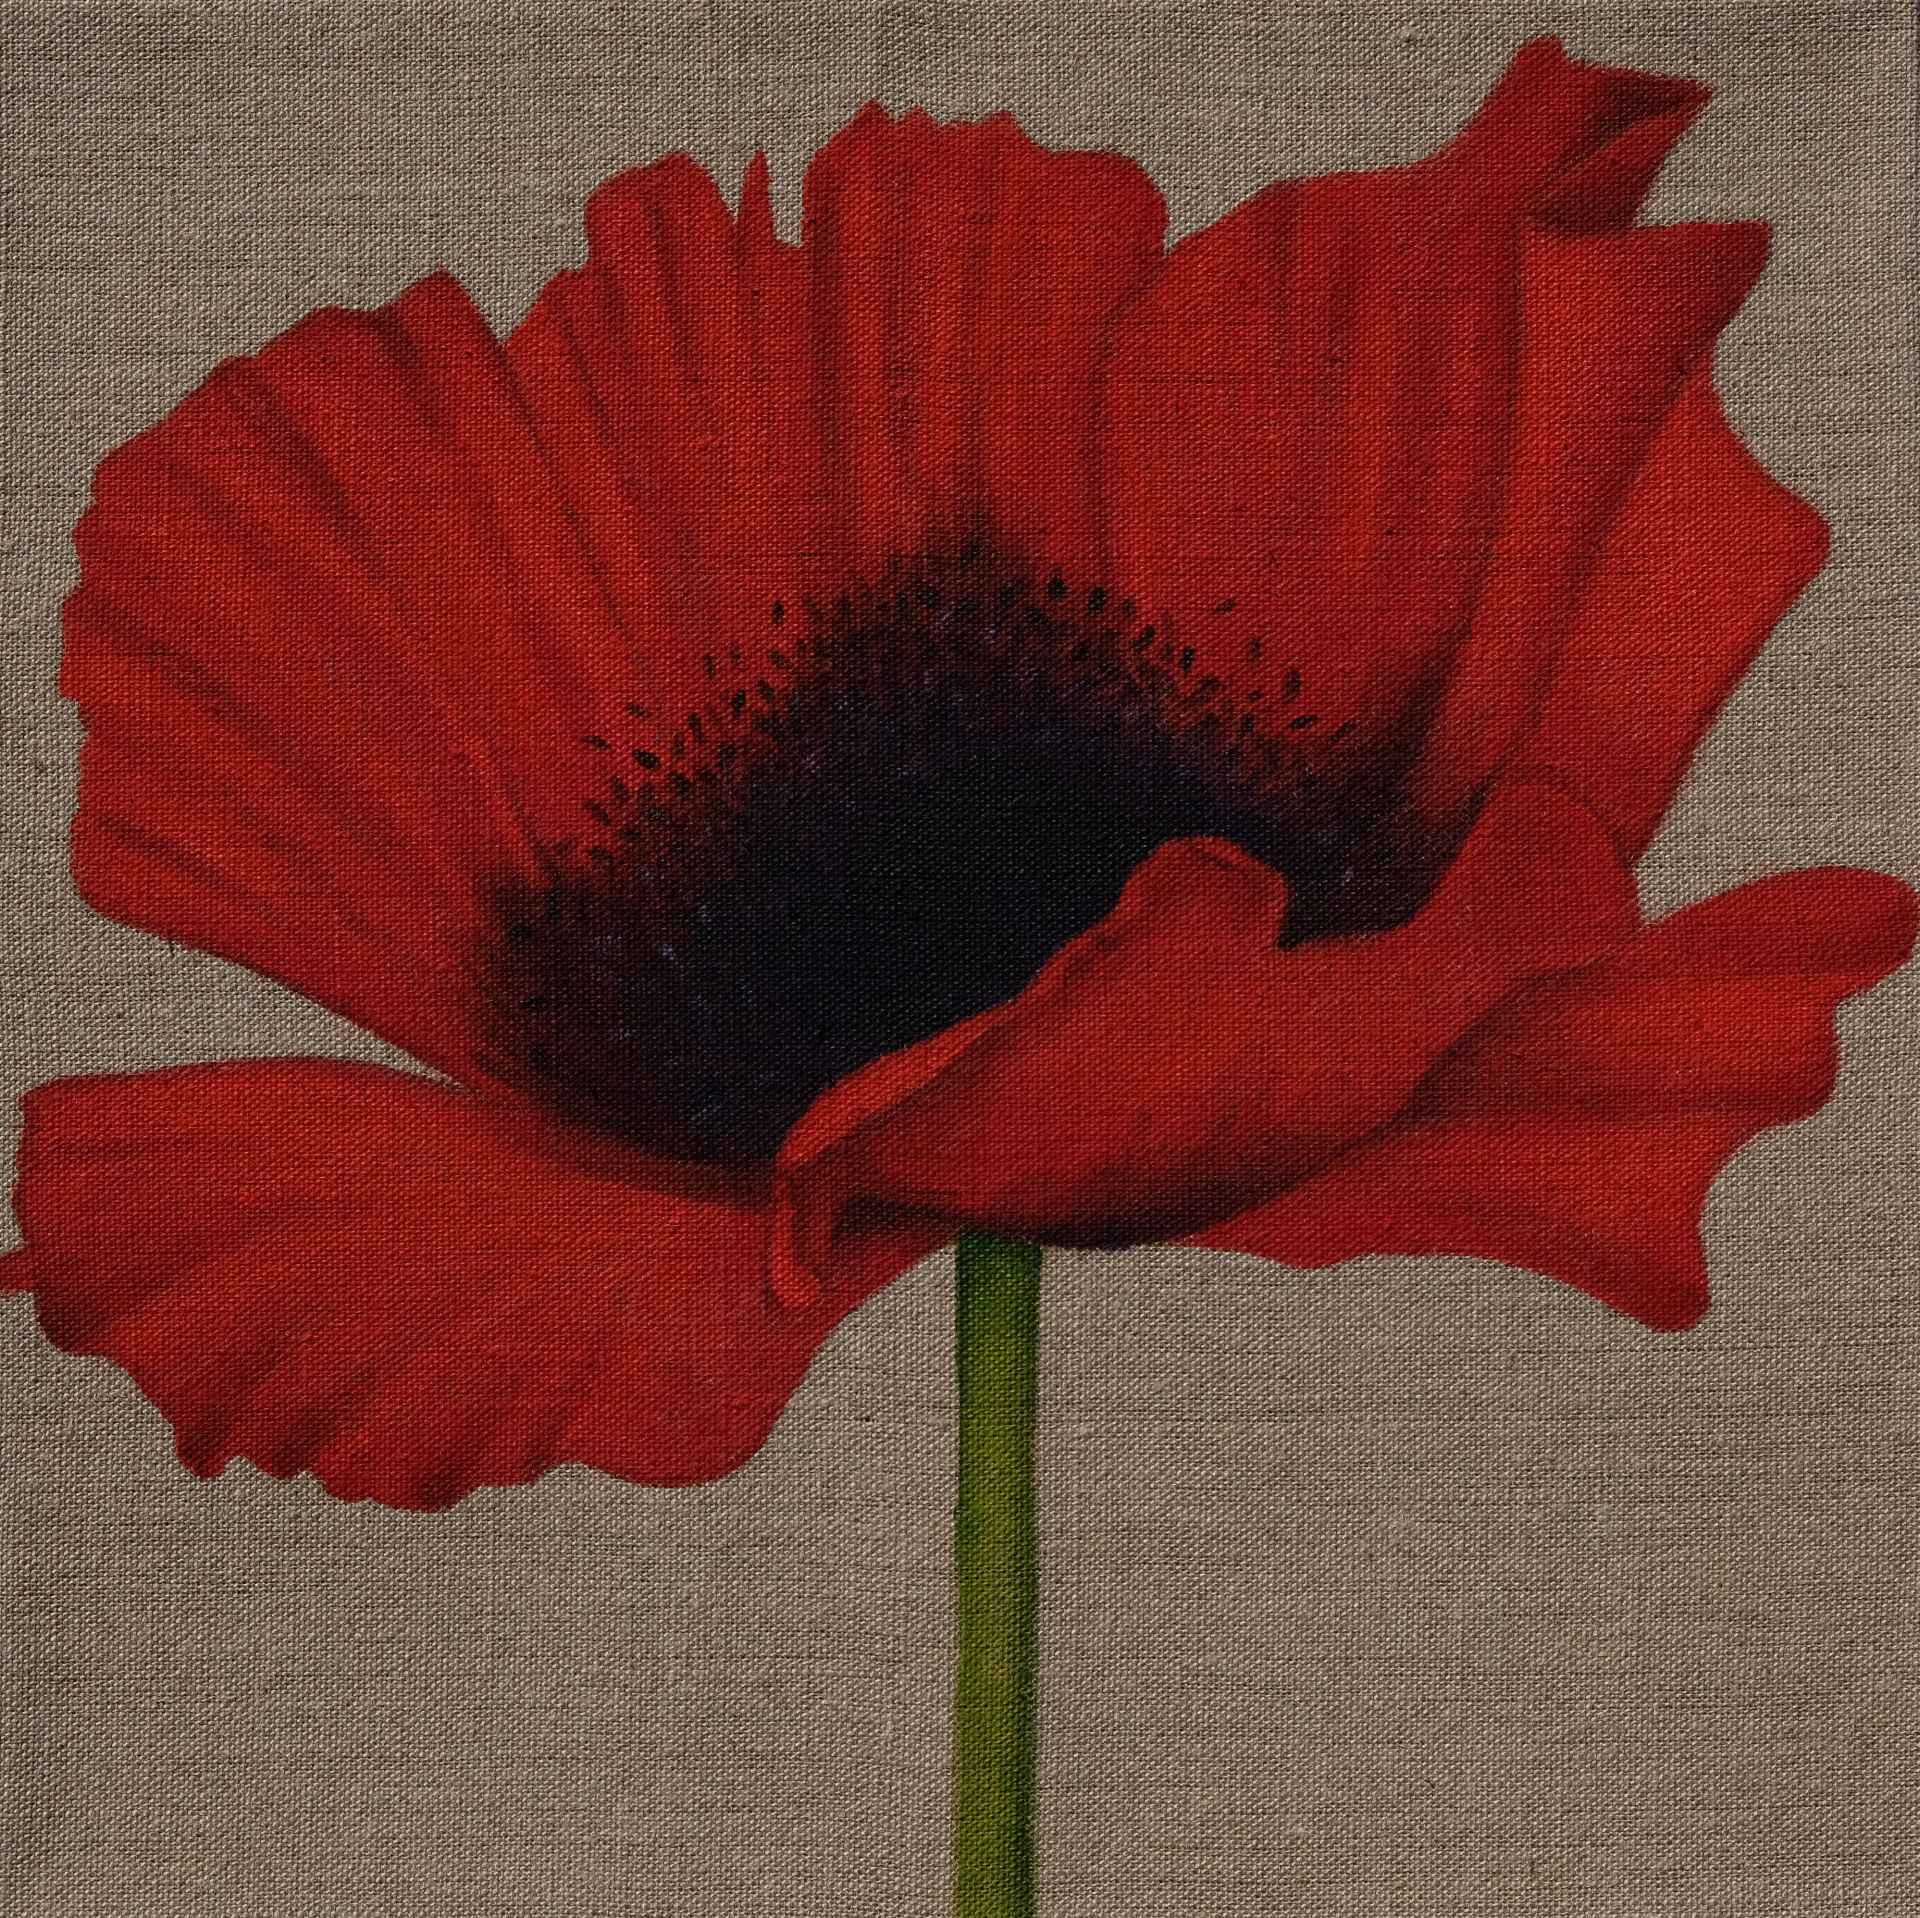 Red Poppy On Linen 300 X 300 Jaci Hogan Art